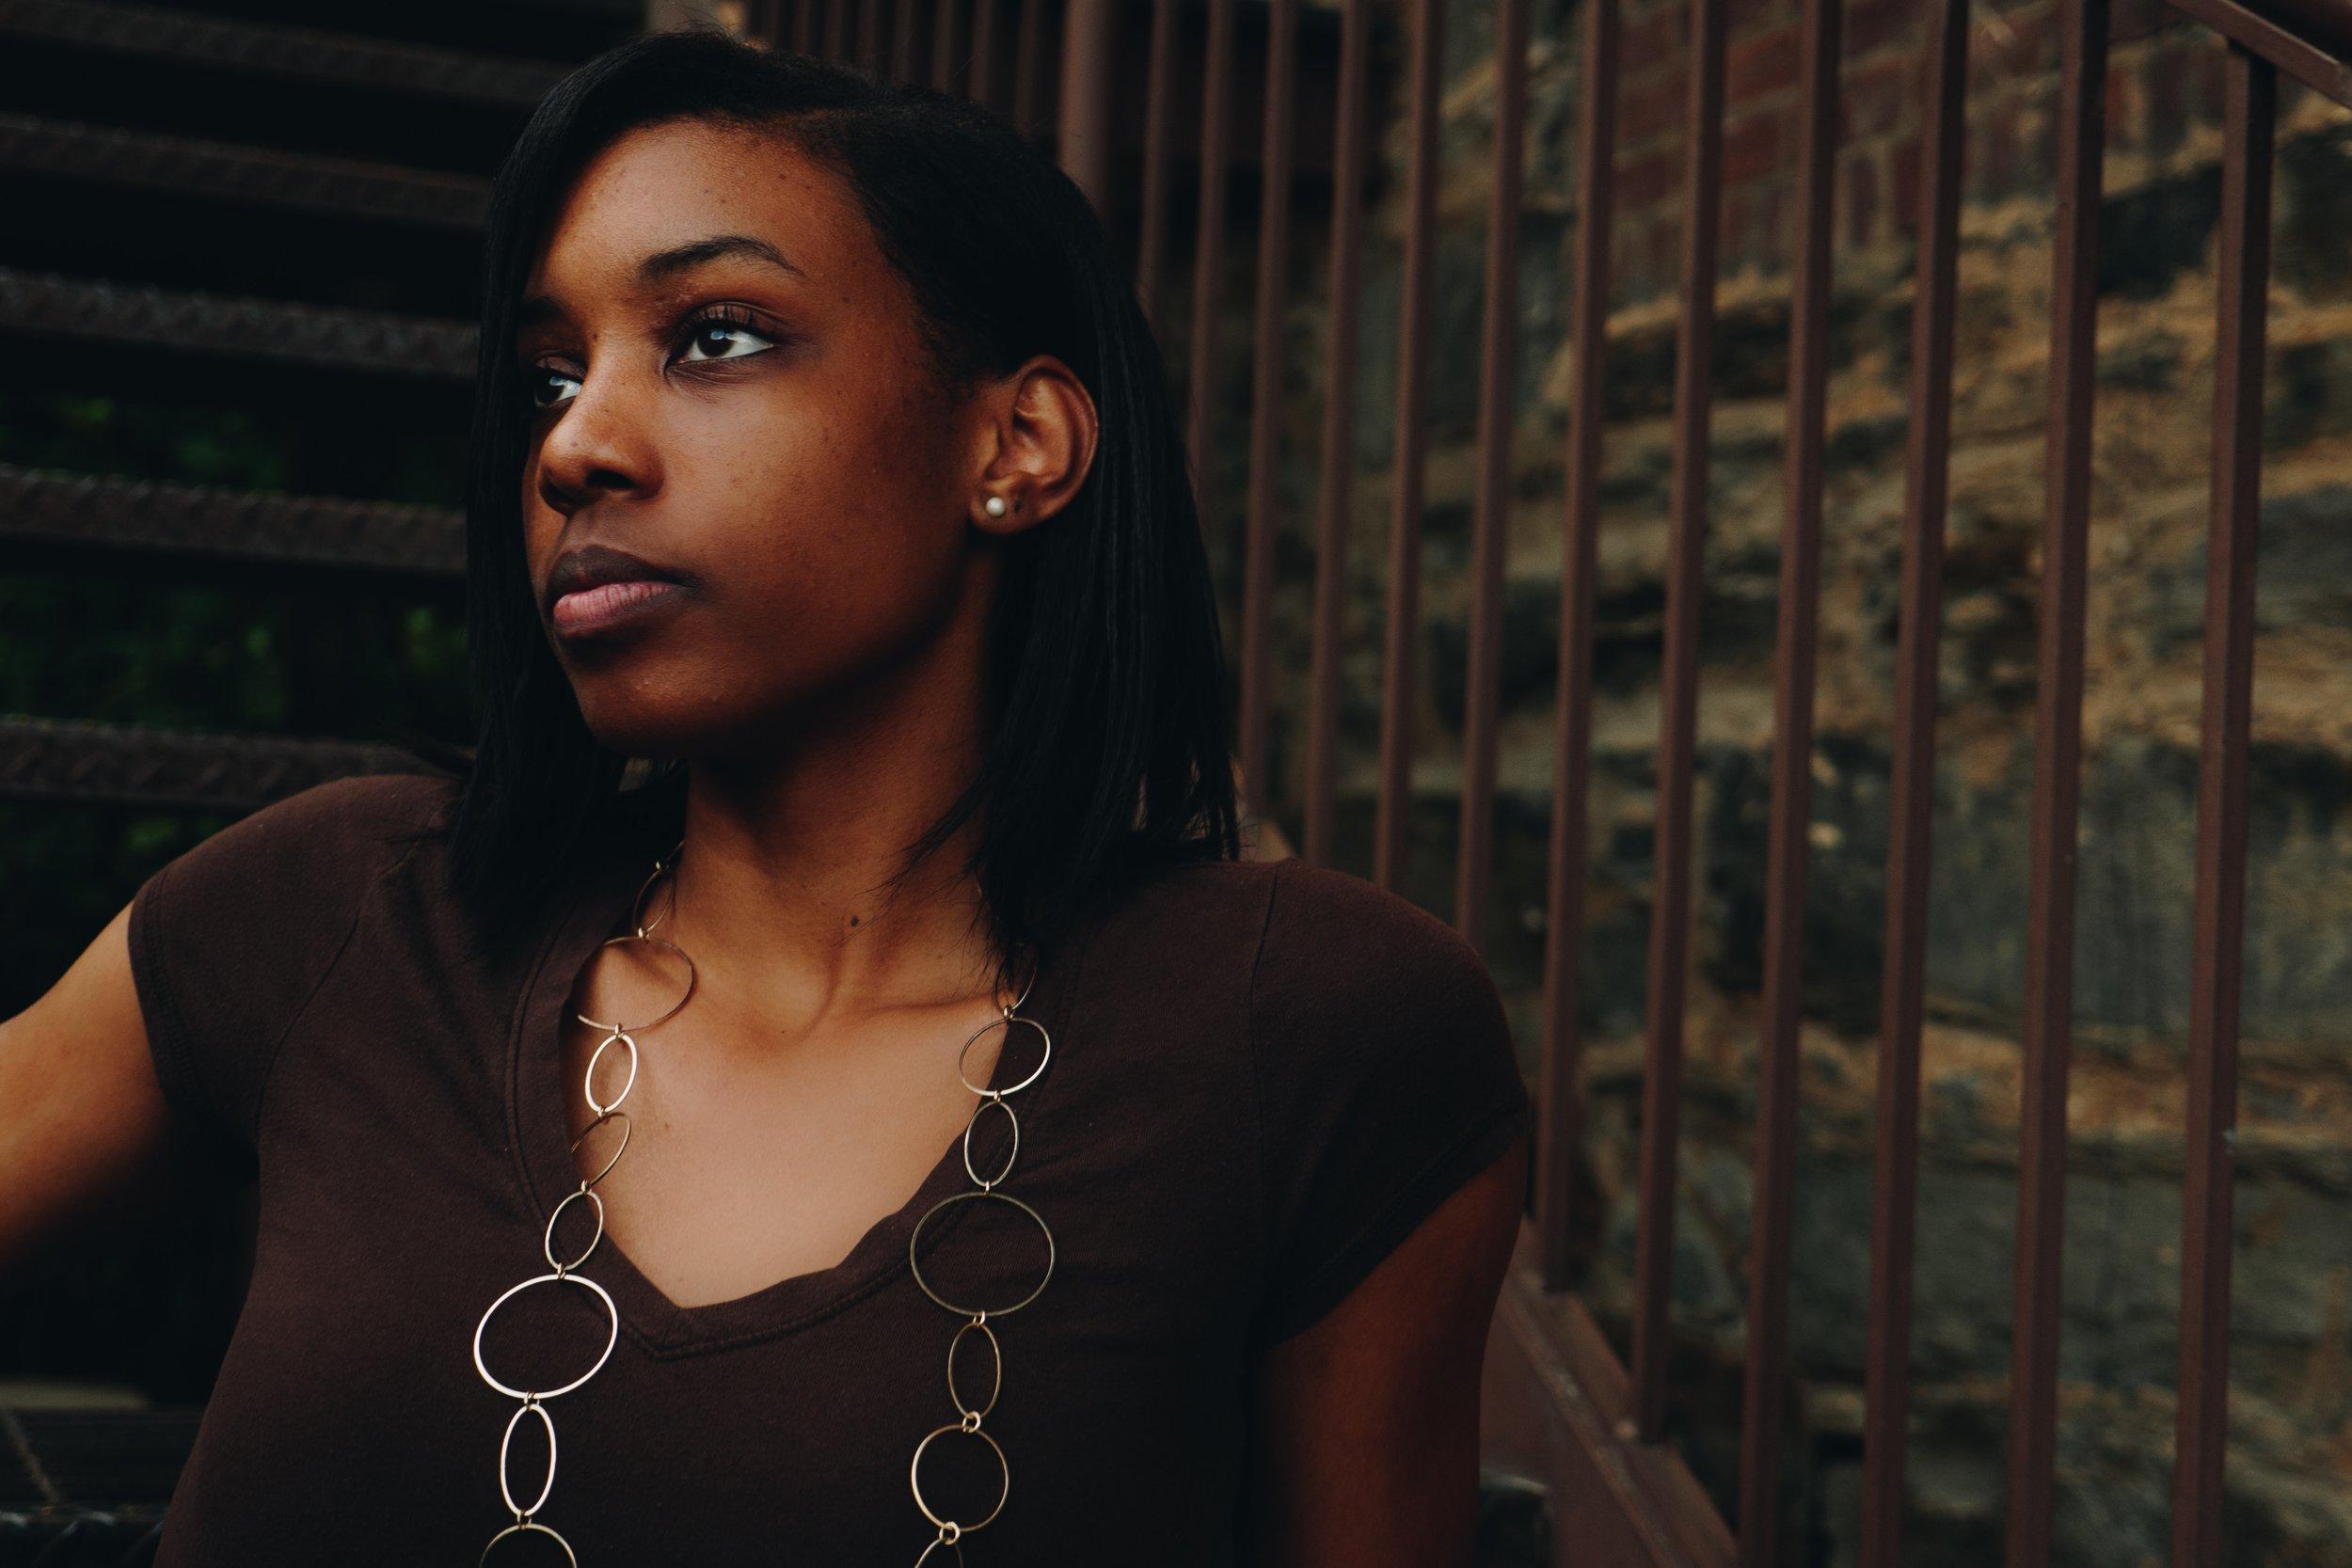 Photo credit: Eye for Ebony on Unsplash